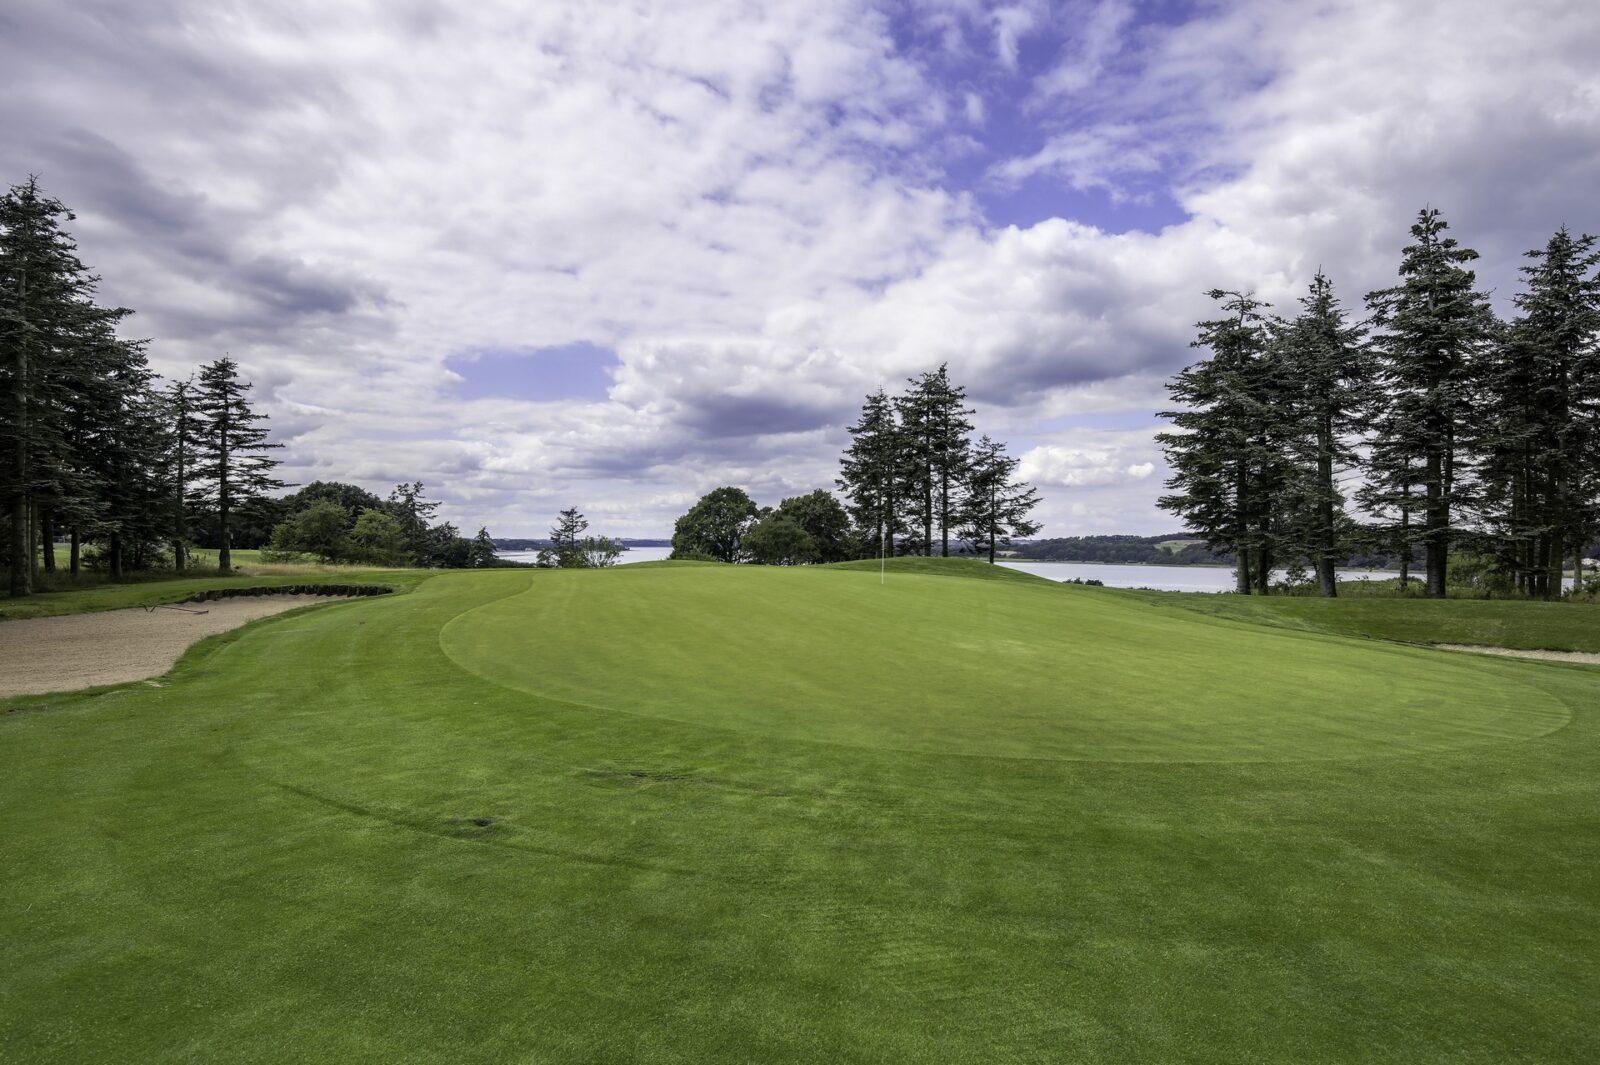 Gol Gourmet.dk Mariagerfjord Golfklub HDR foto 17